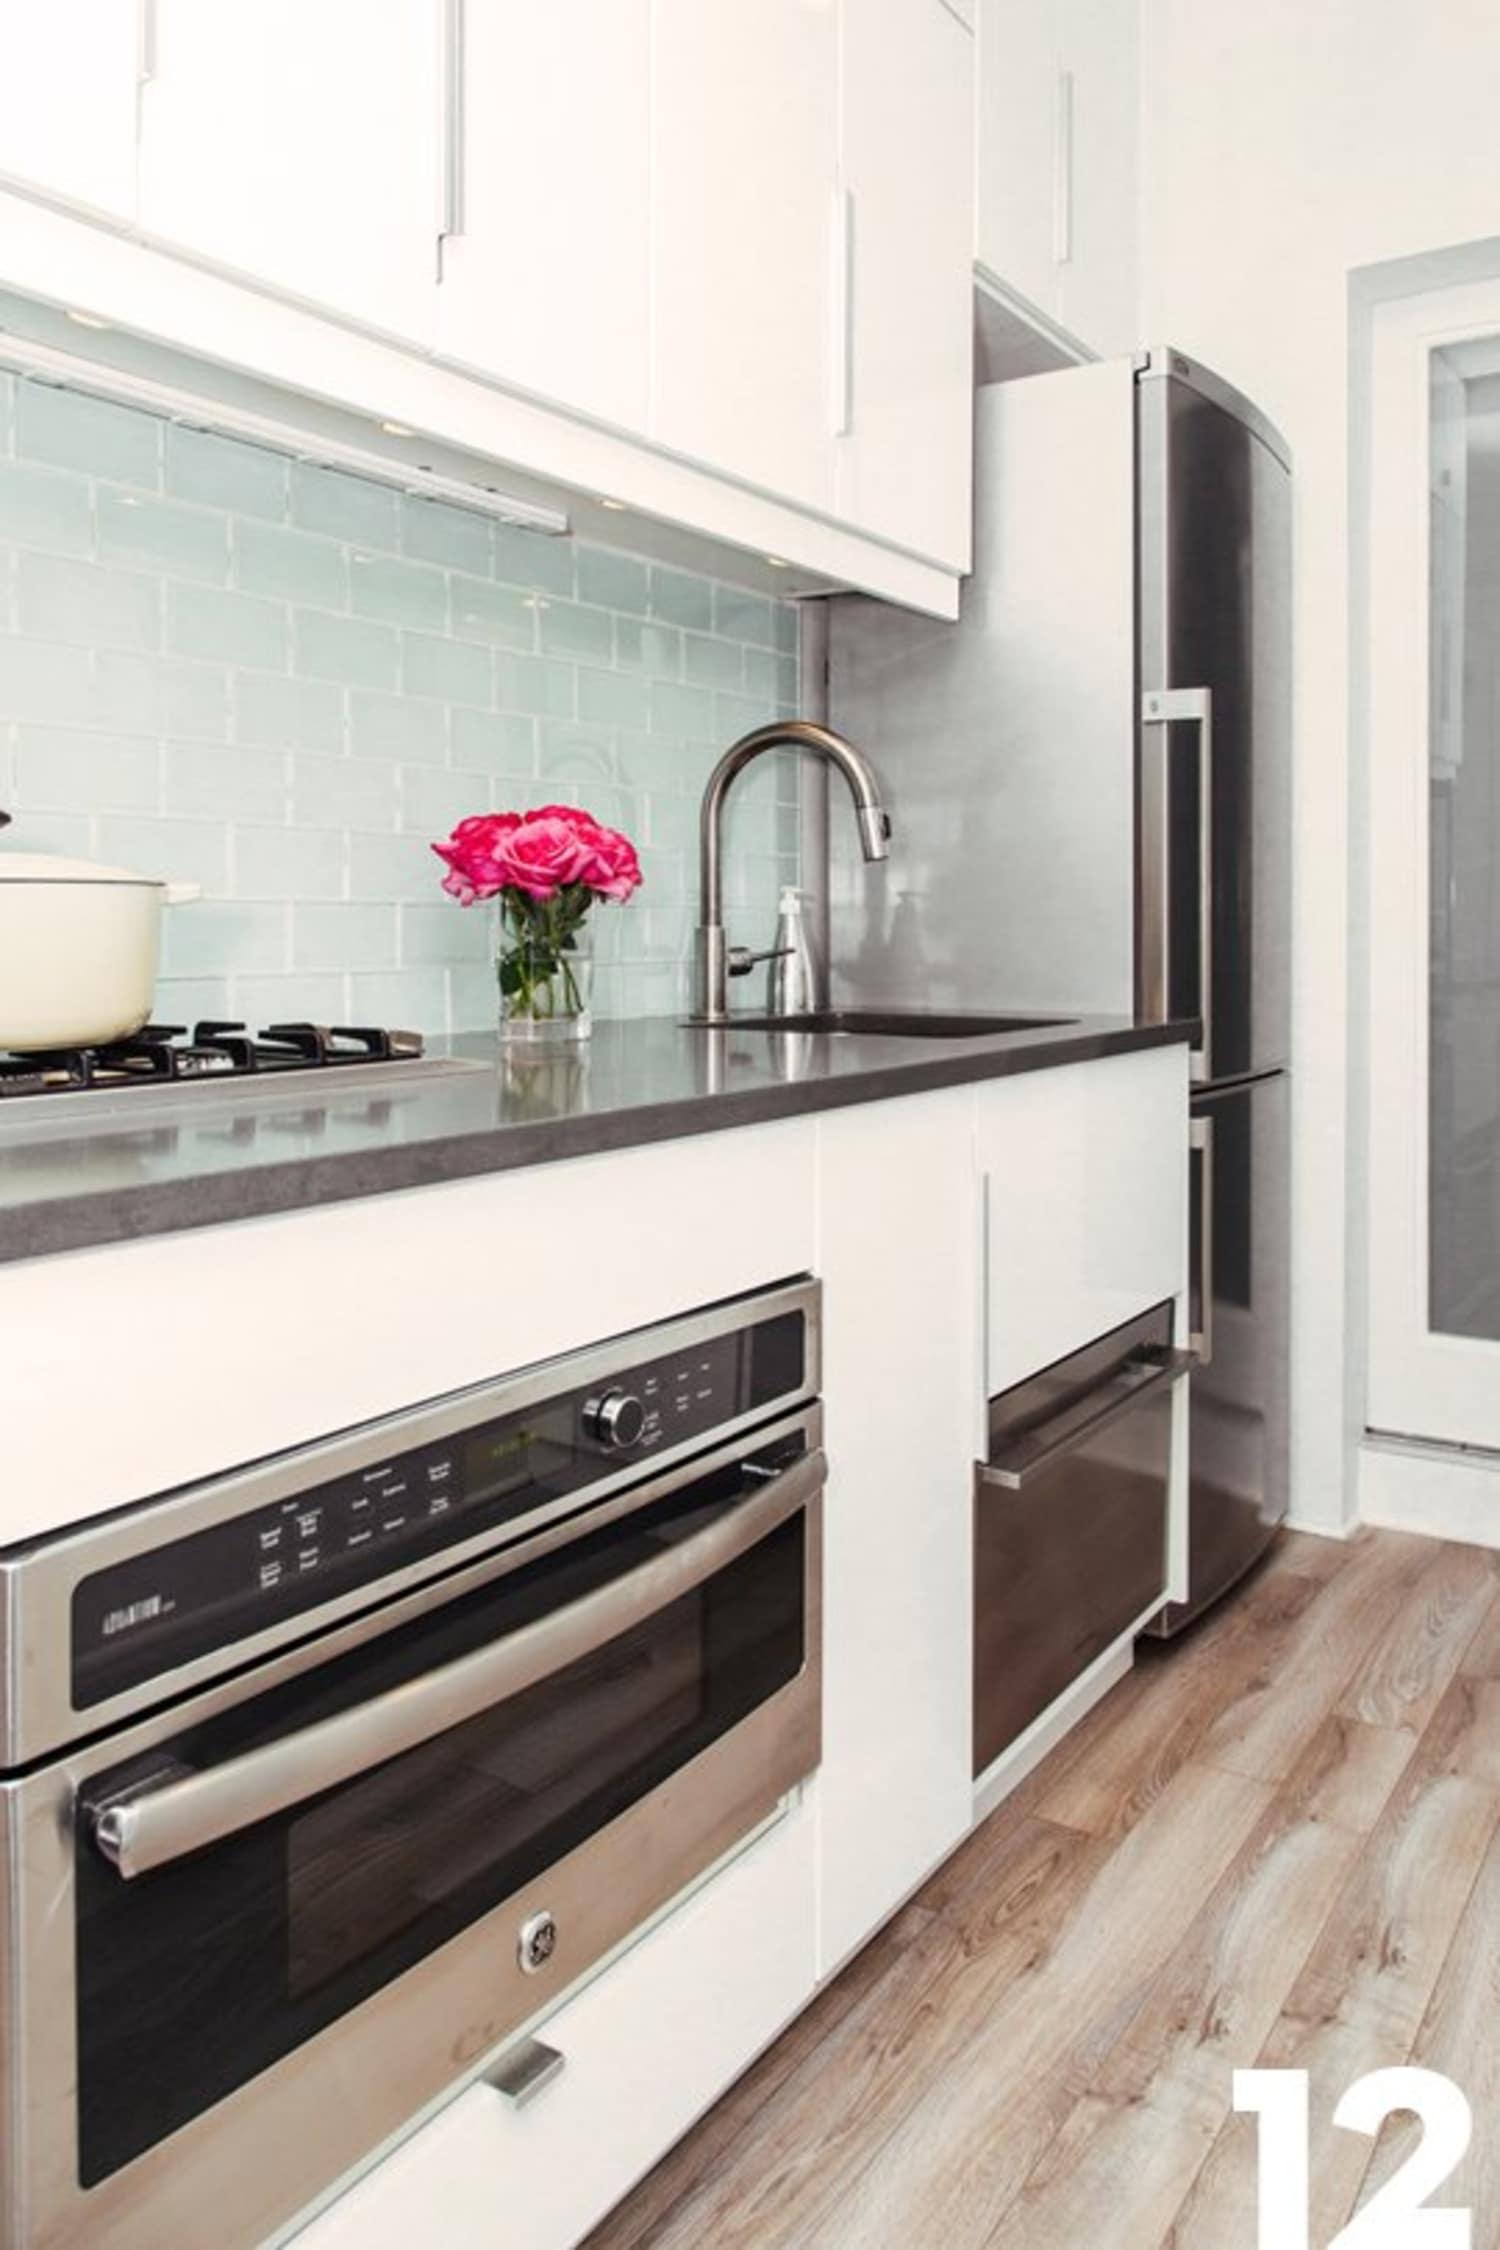 jennifer u2019s kitchen renovation  what it really cost  u2013 a